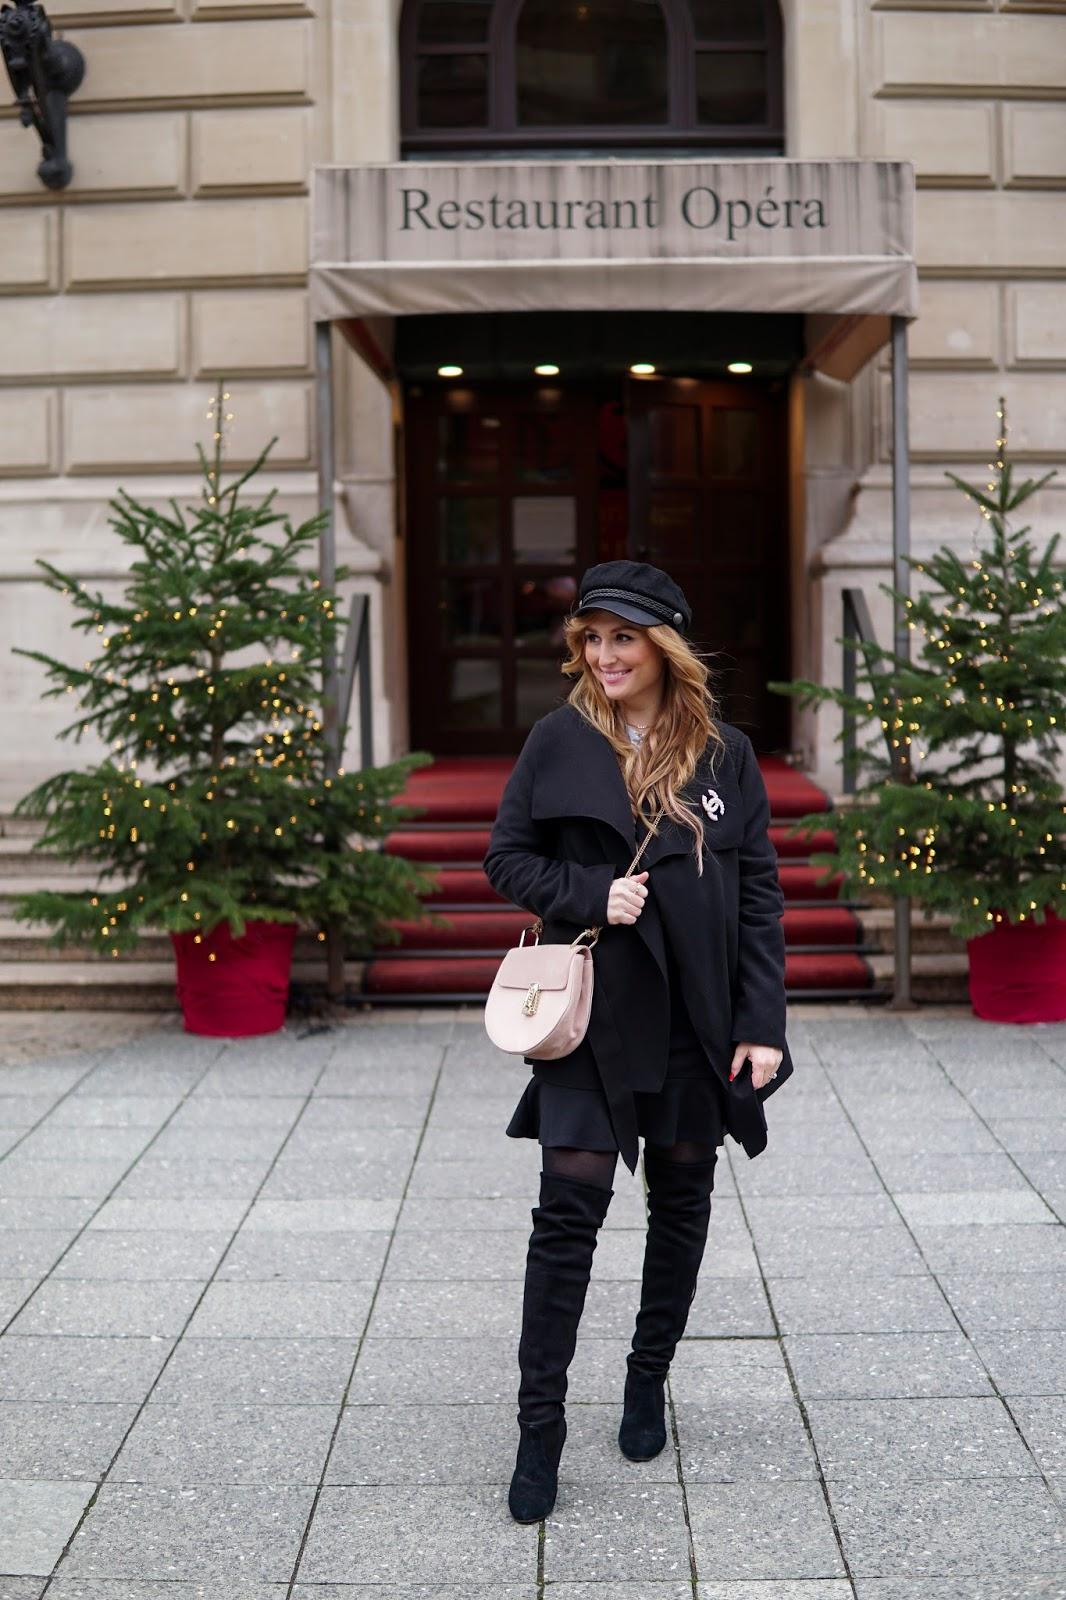 Chanel-brosche-fashionstylebyjohanna-fashionblog-frankfurt-blogger-fashionblogger-bloggerdeutschland-lifestyleblog-modeblog-frankfurt-germanblogger-styleblog-SCHIFFER-MÜTZE-streetwear-chic